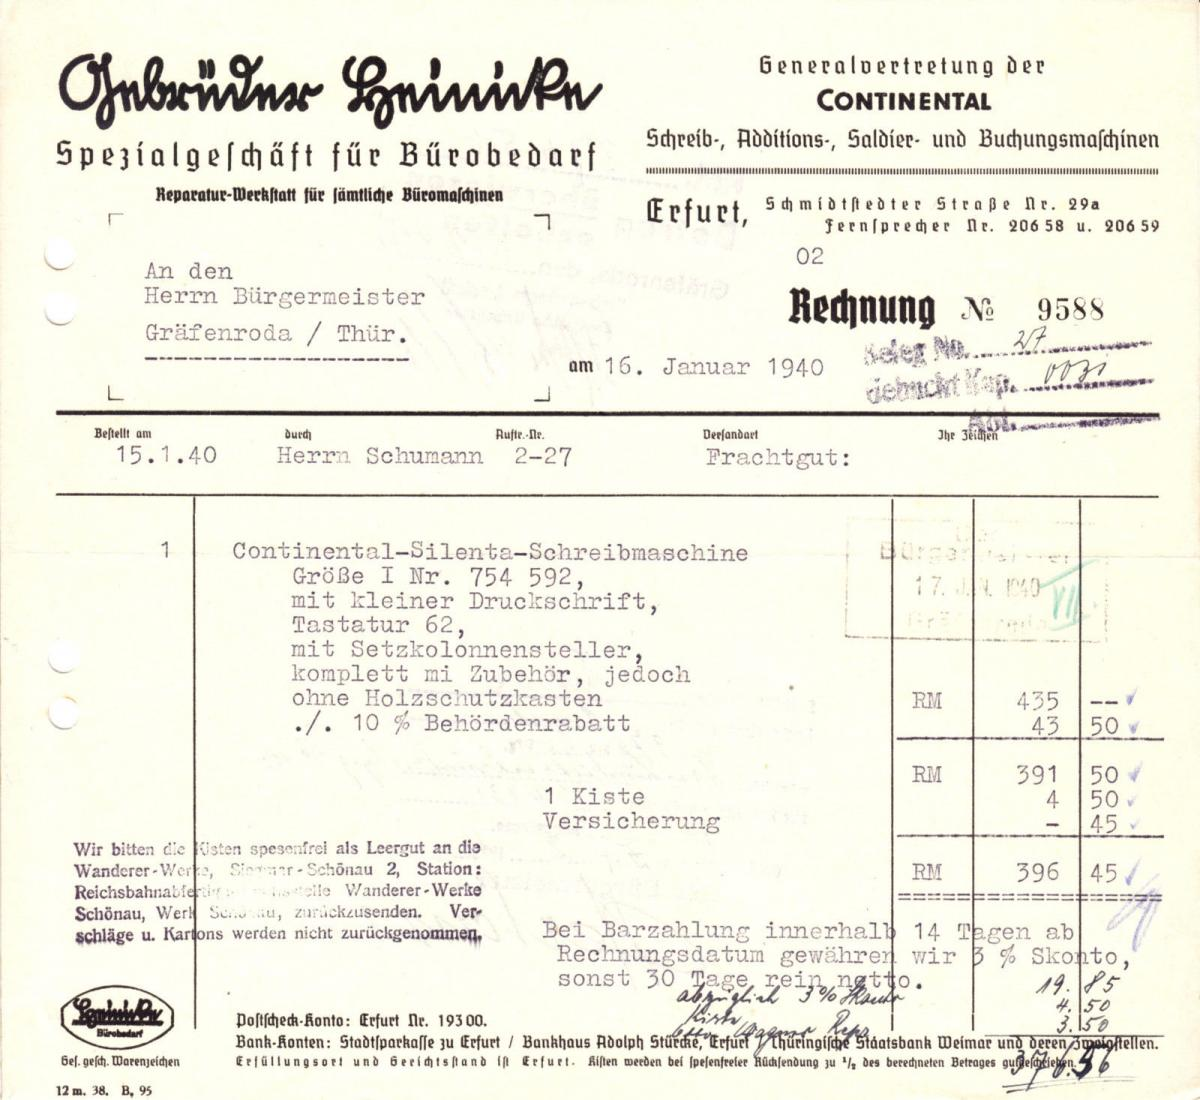 Rechnung, Fa. Gebrüder Reinicke, Bürobedarf, Erfurt, 16.1.1940